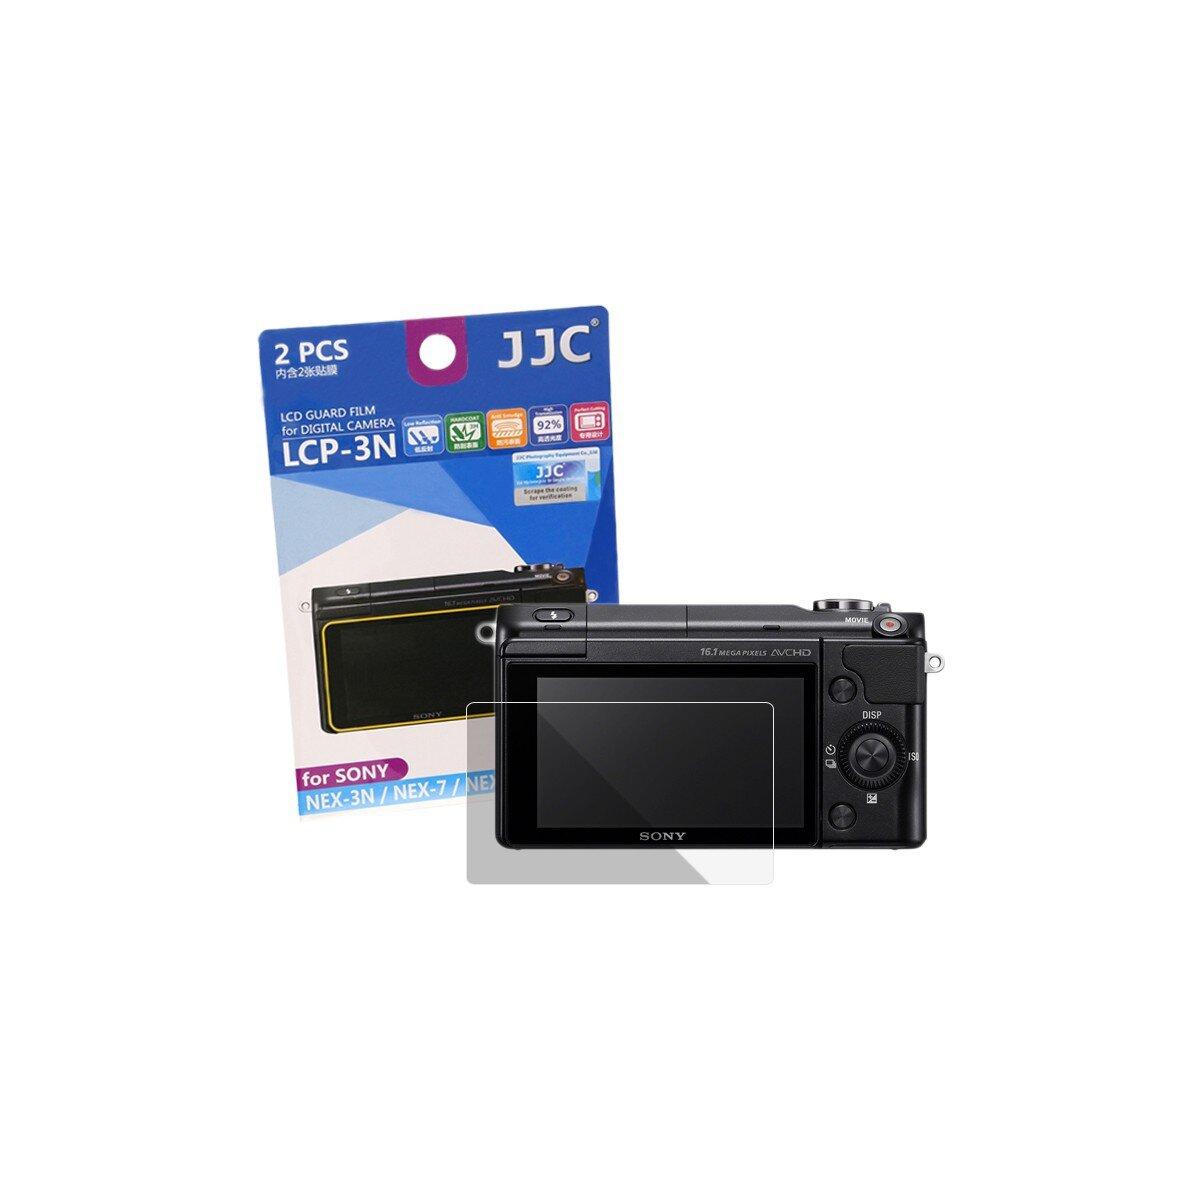 JJC Displayschutzfolie Screen Protector Kratzschutz passgenau kompatibel mit Sony NEX-3N, NEX-7, NEX-6, A6300 - LCP-3N